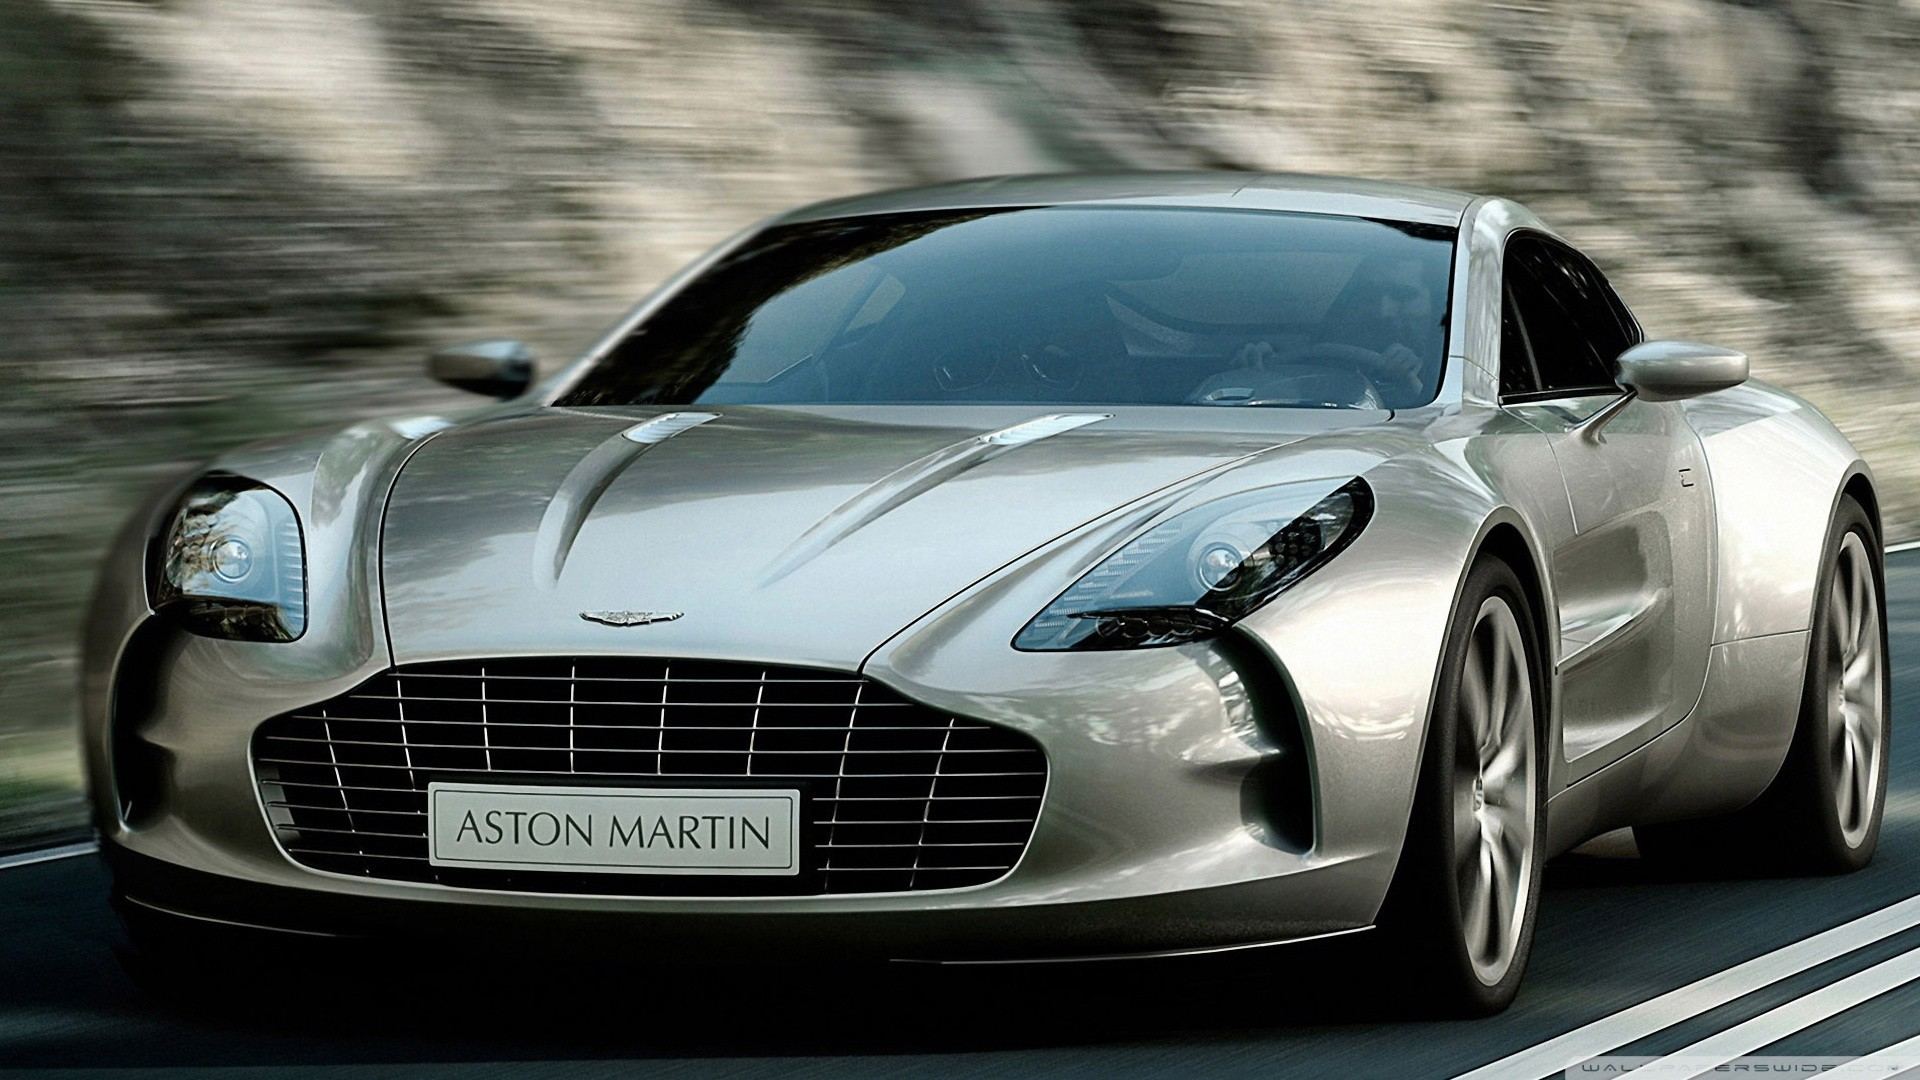 Aston Martin Wallpaper Hd 73 Images